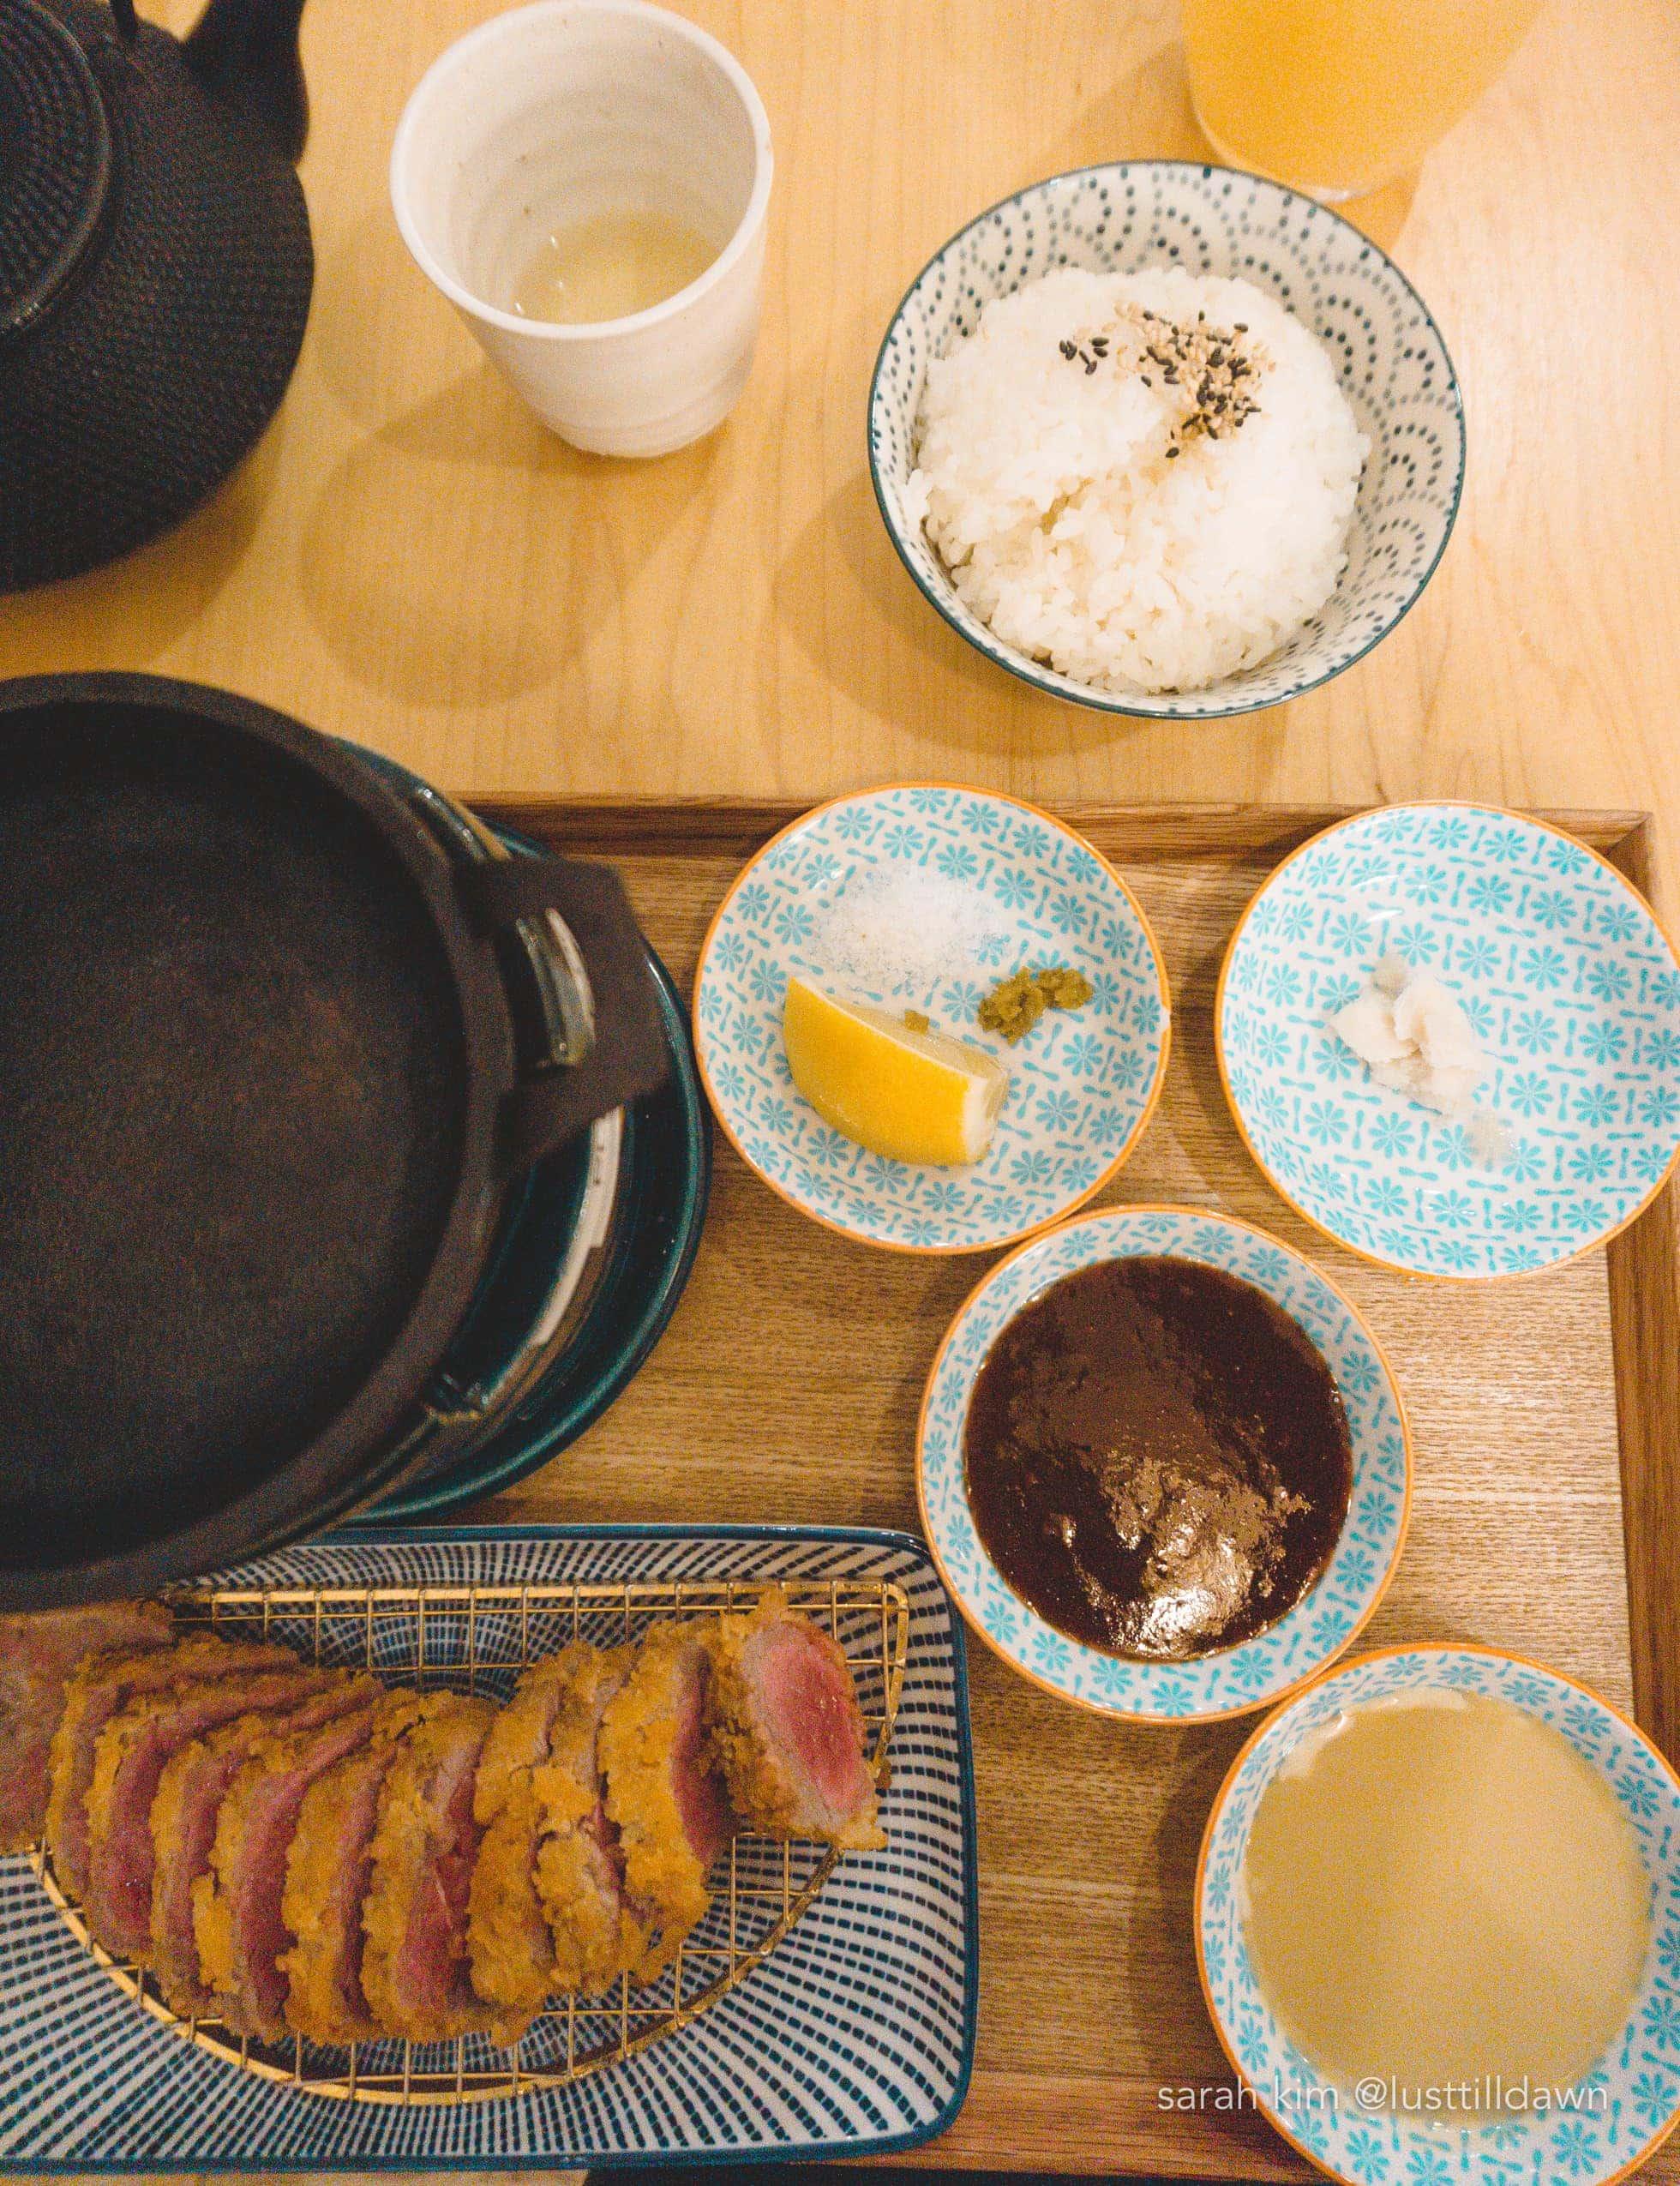 restaurants in soho london best restaurants in soho london www.fromlusttilldawn.com lust till dawn katsu wagyu beef machiya